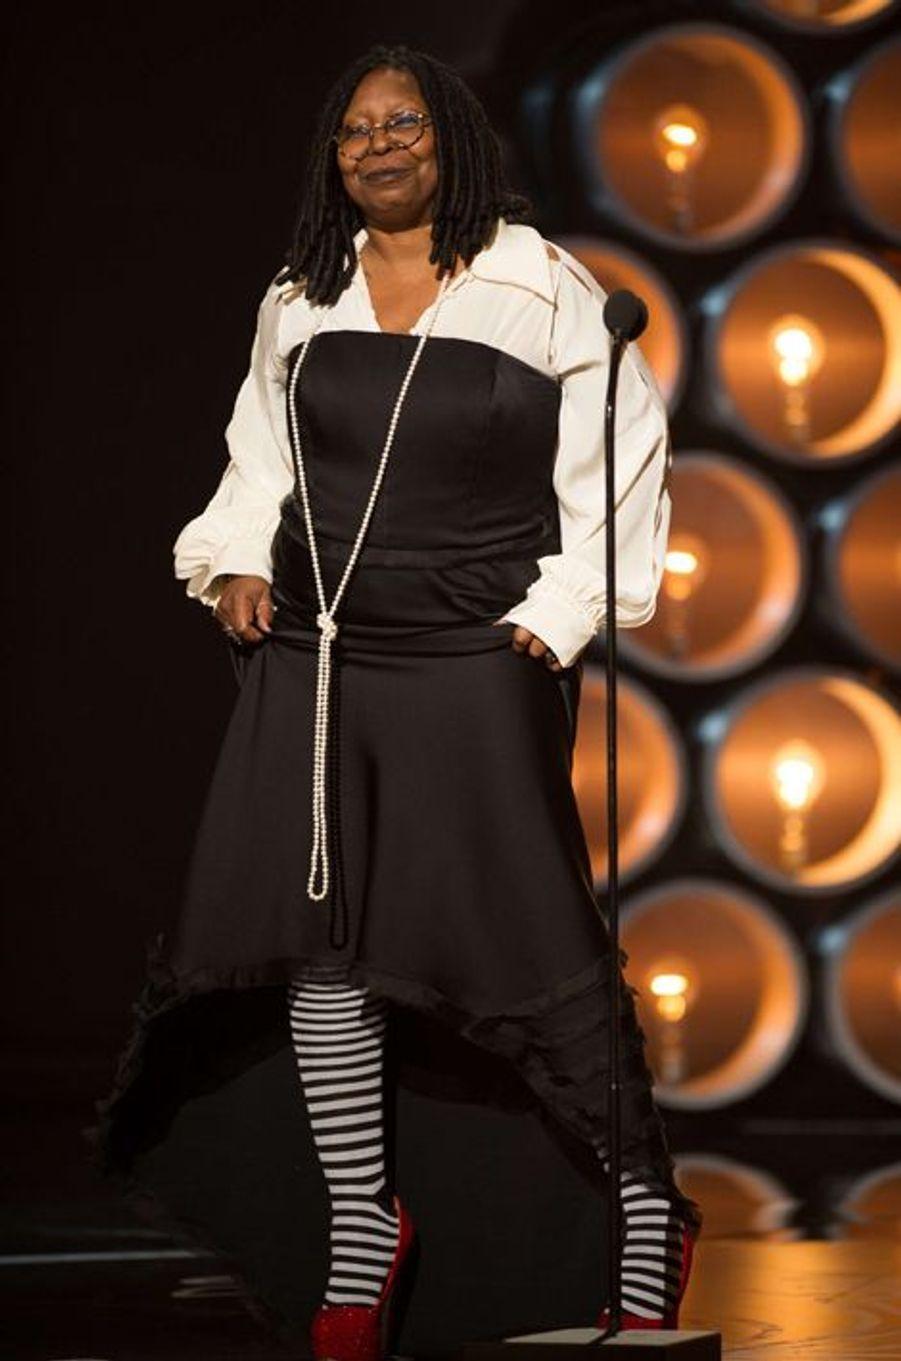 Whoopi Goldberg aux Oscars 2014